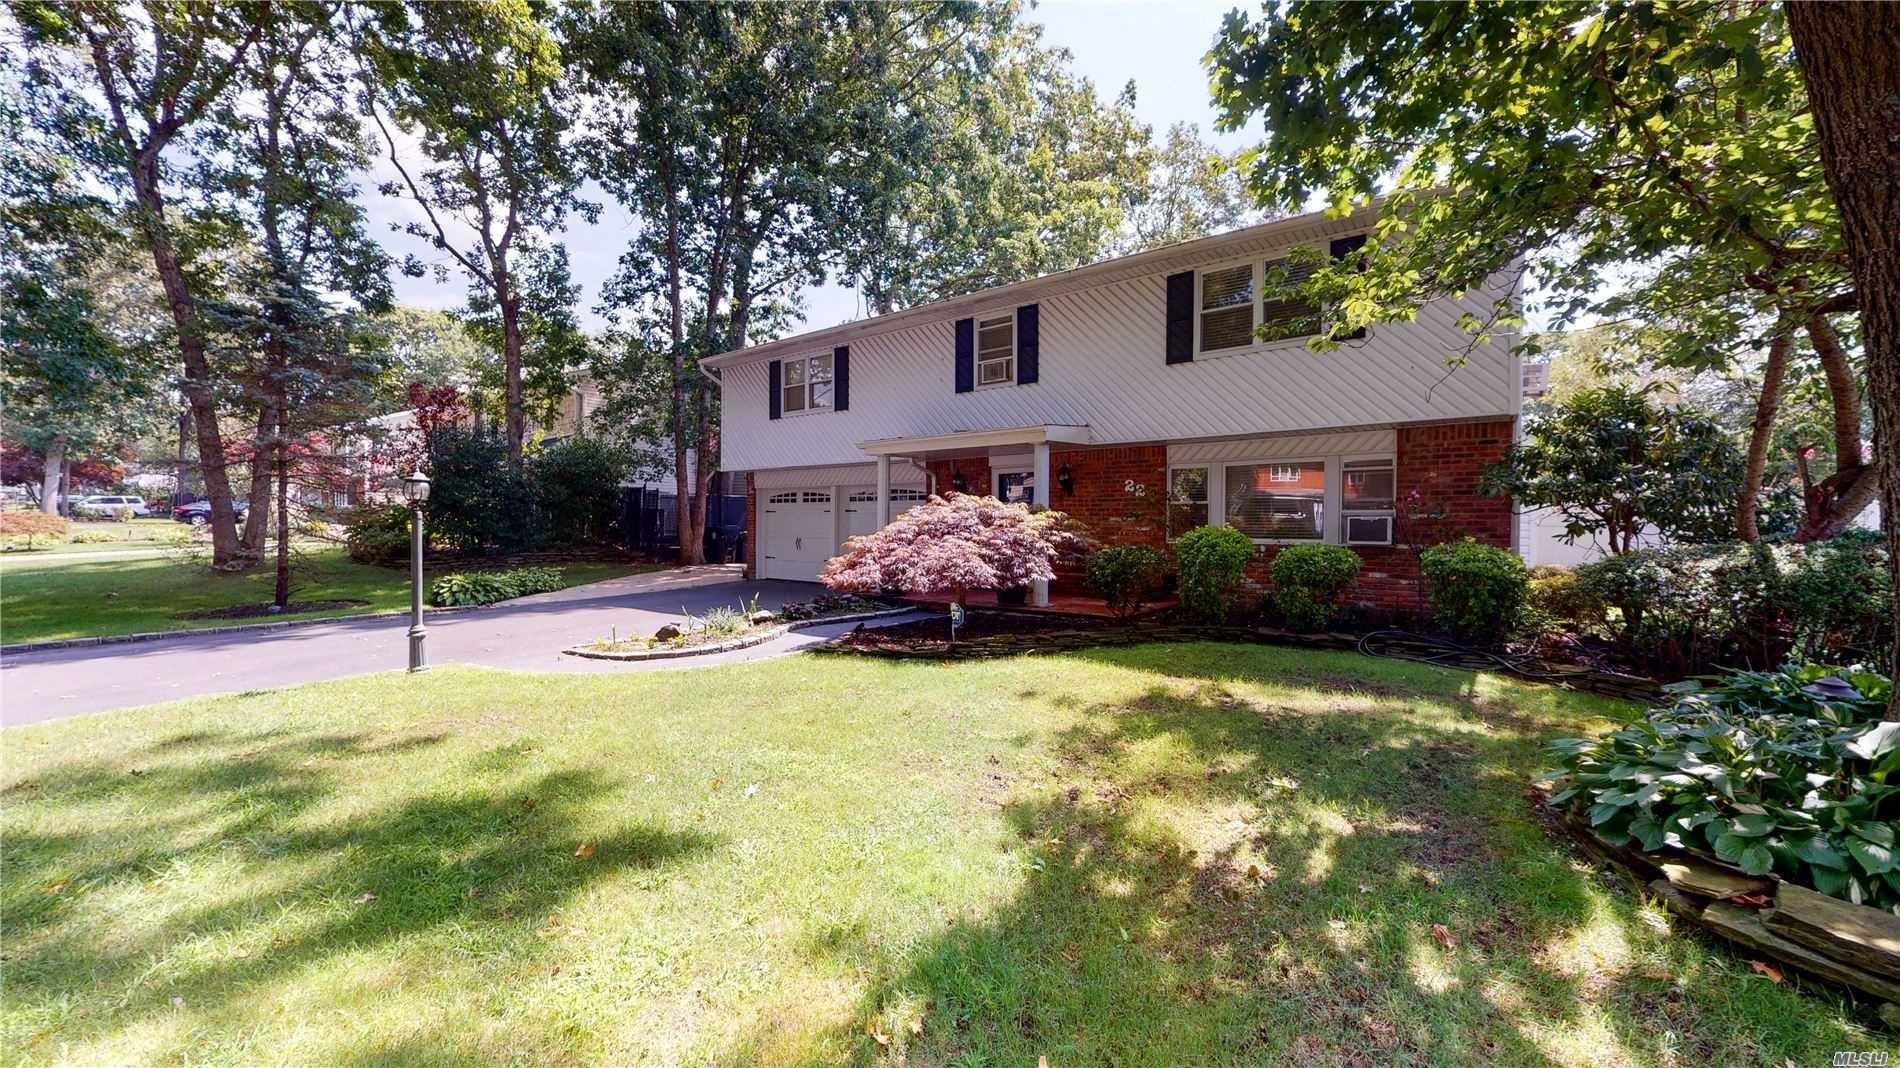 22 Cornelia Lane, Lake Grove, NY 11755 - MLS#: 3246931